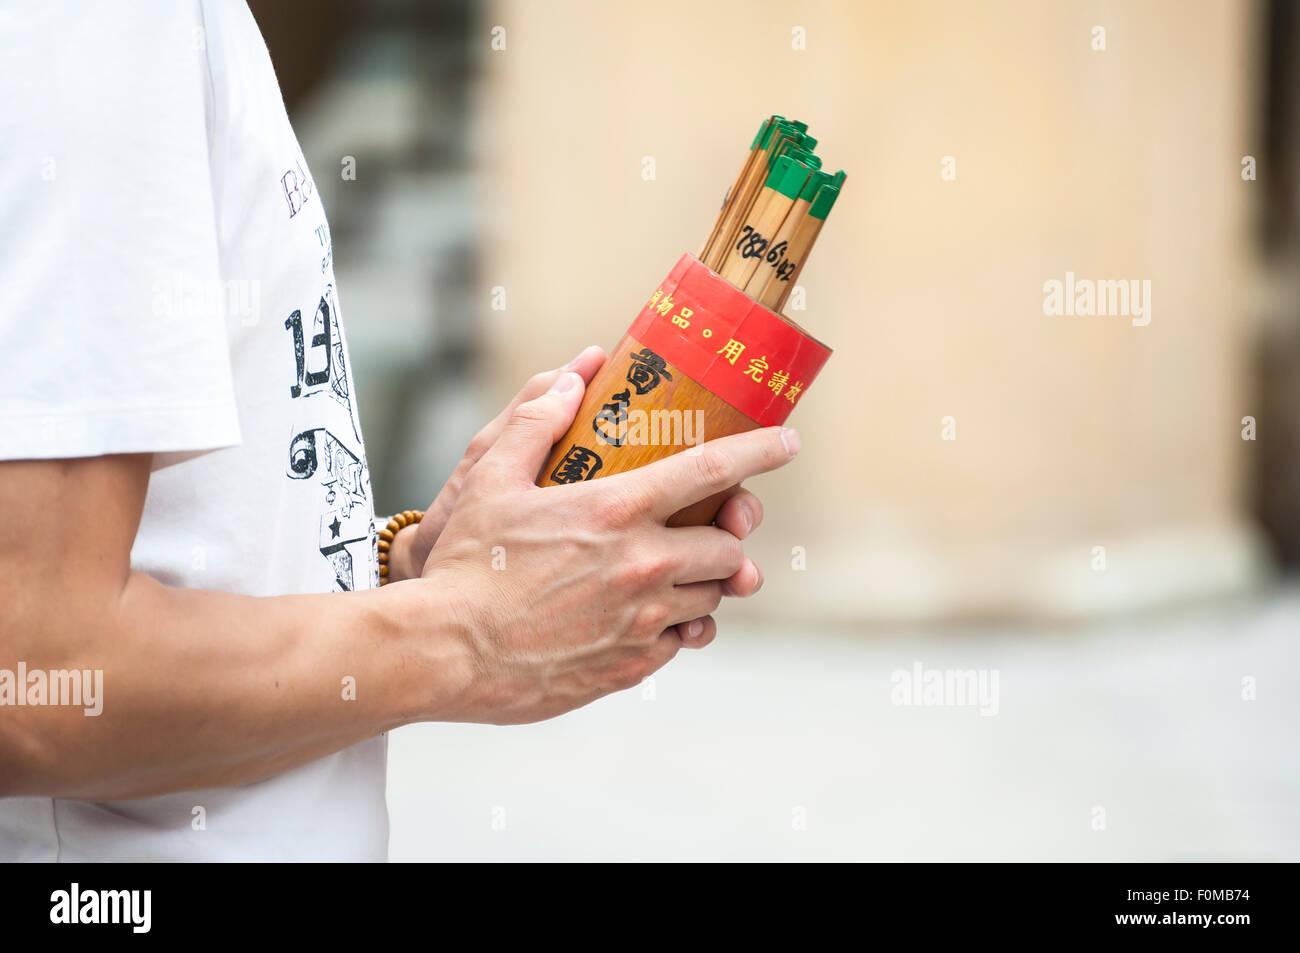 Man holds a box of fortune sticks at Wong Tai Sin temple, Hong Kong - Stock Image